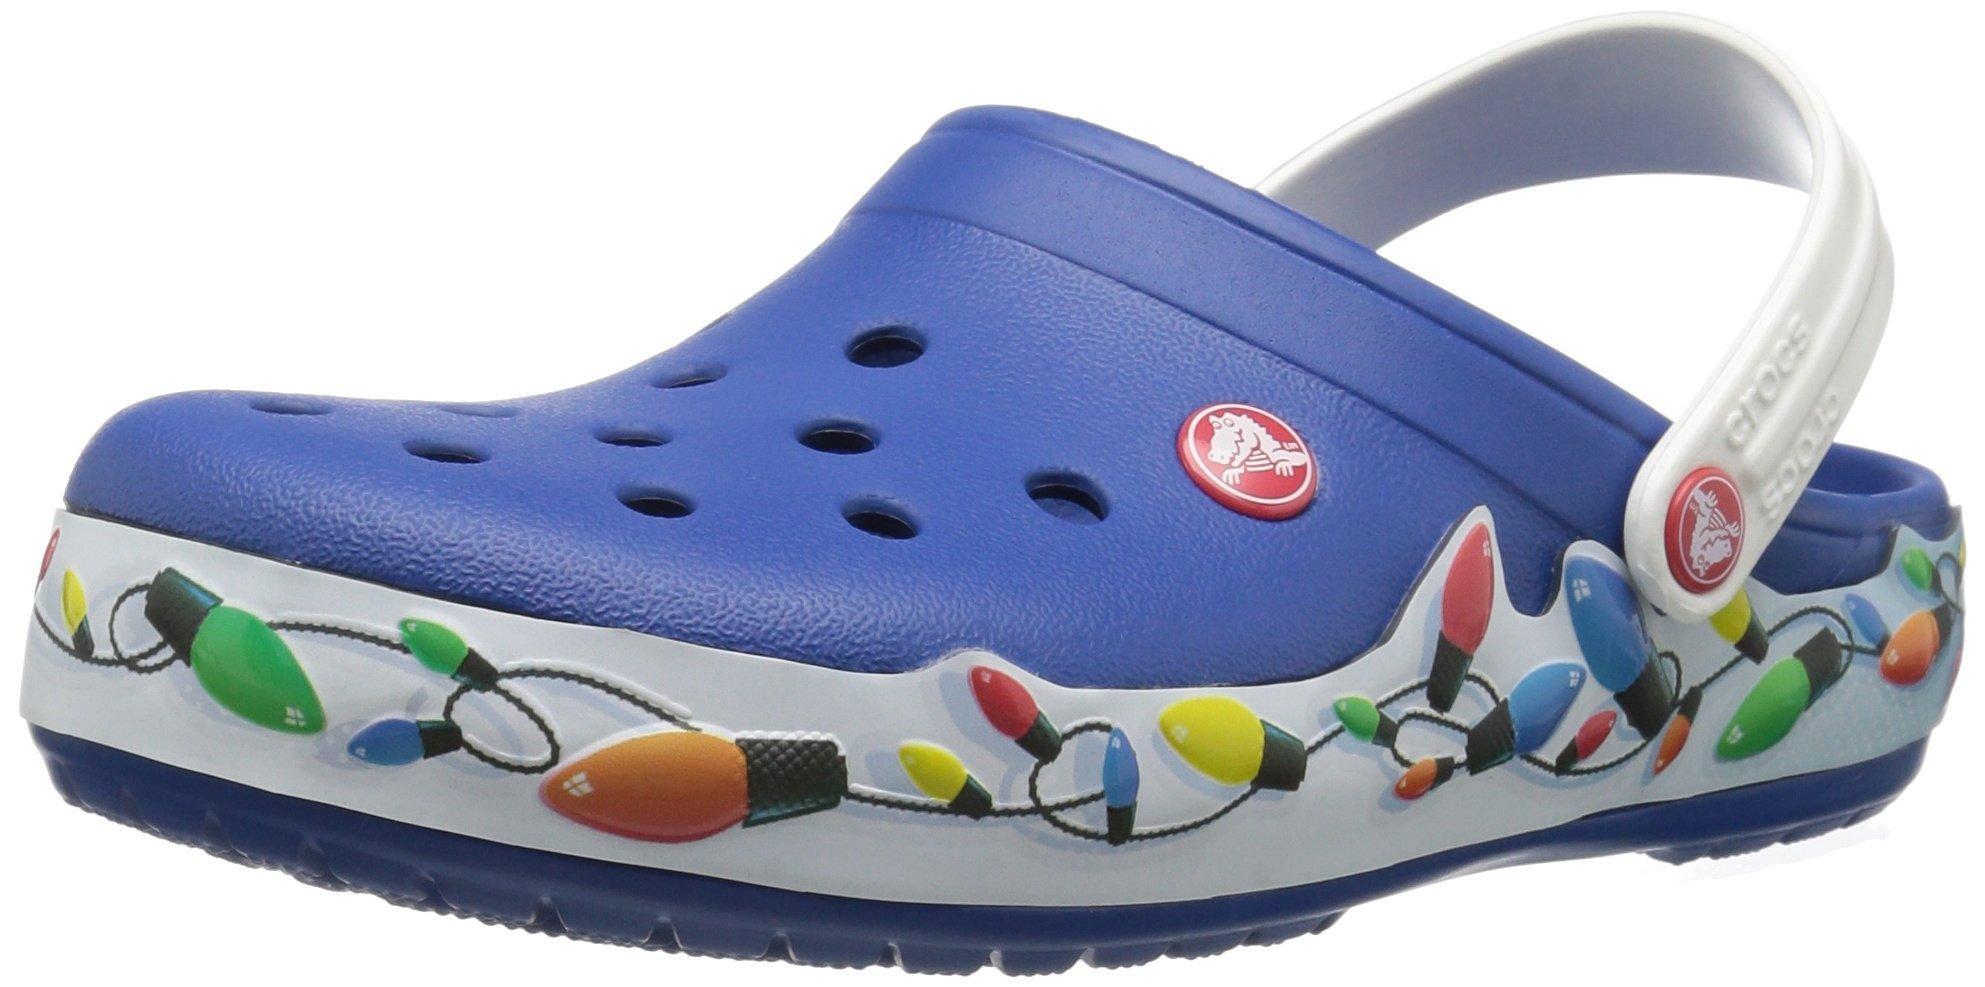 Crocs™ Crocband Holiday Lights Clog